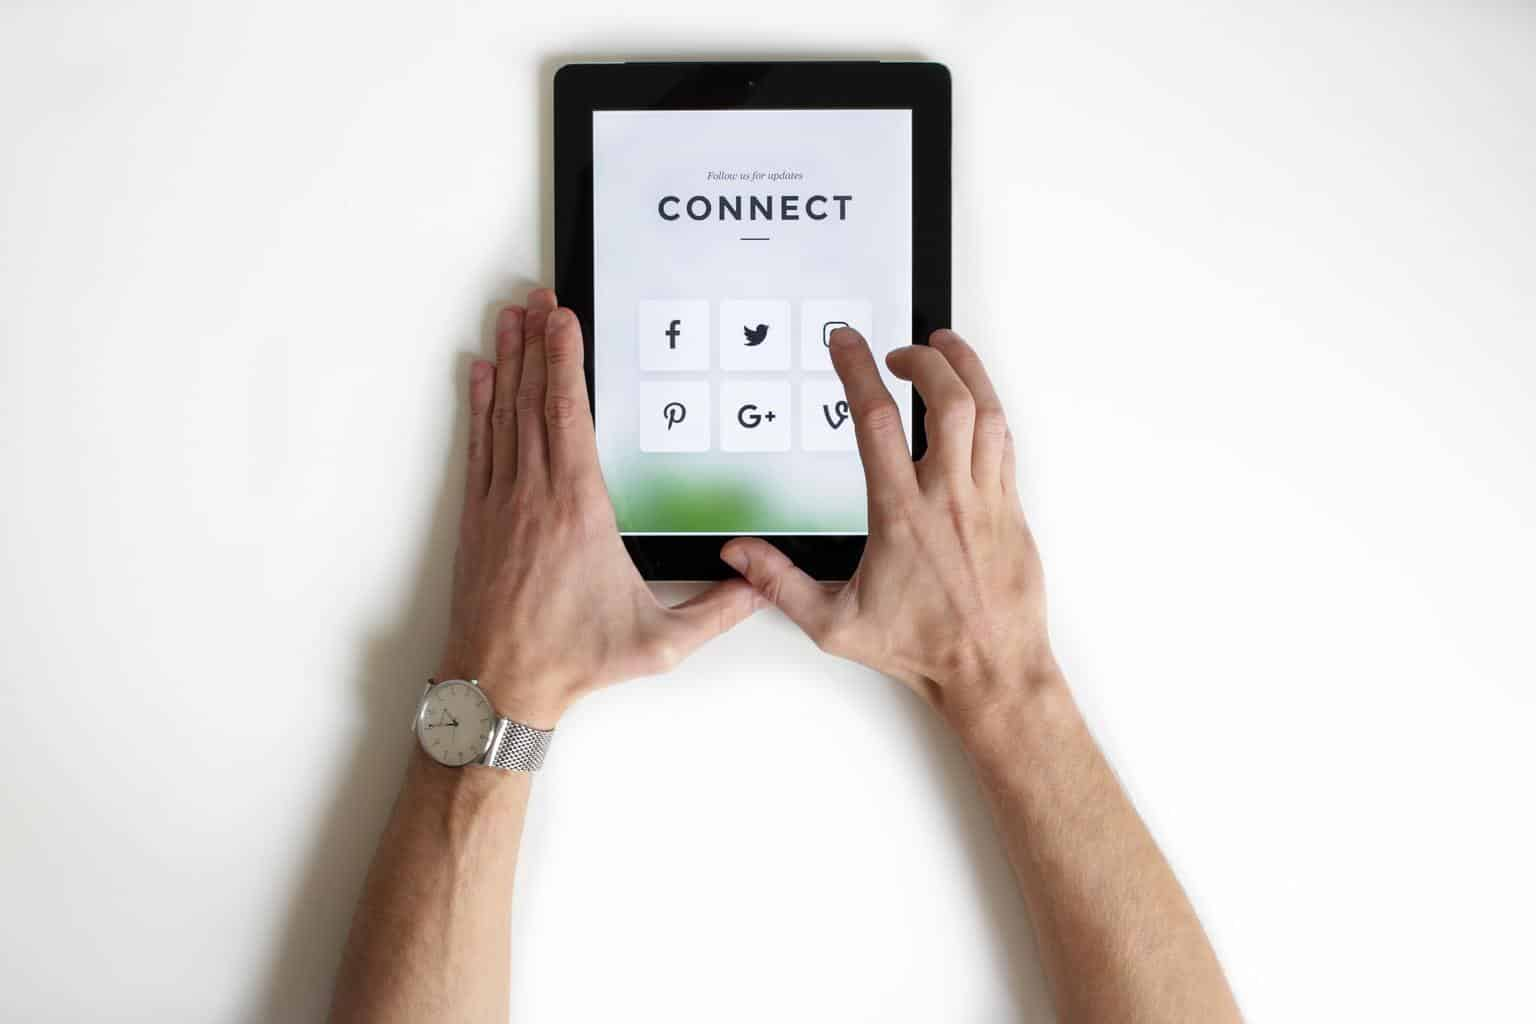 Connect social media option